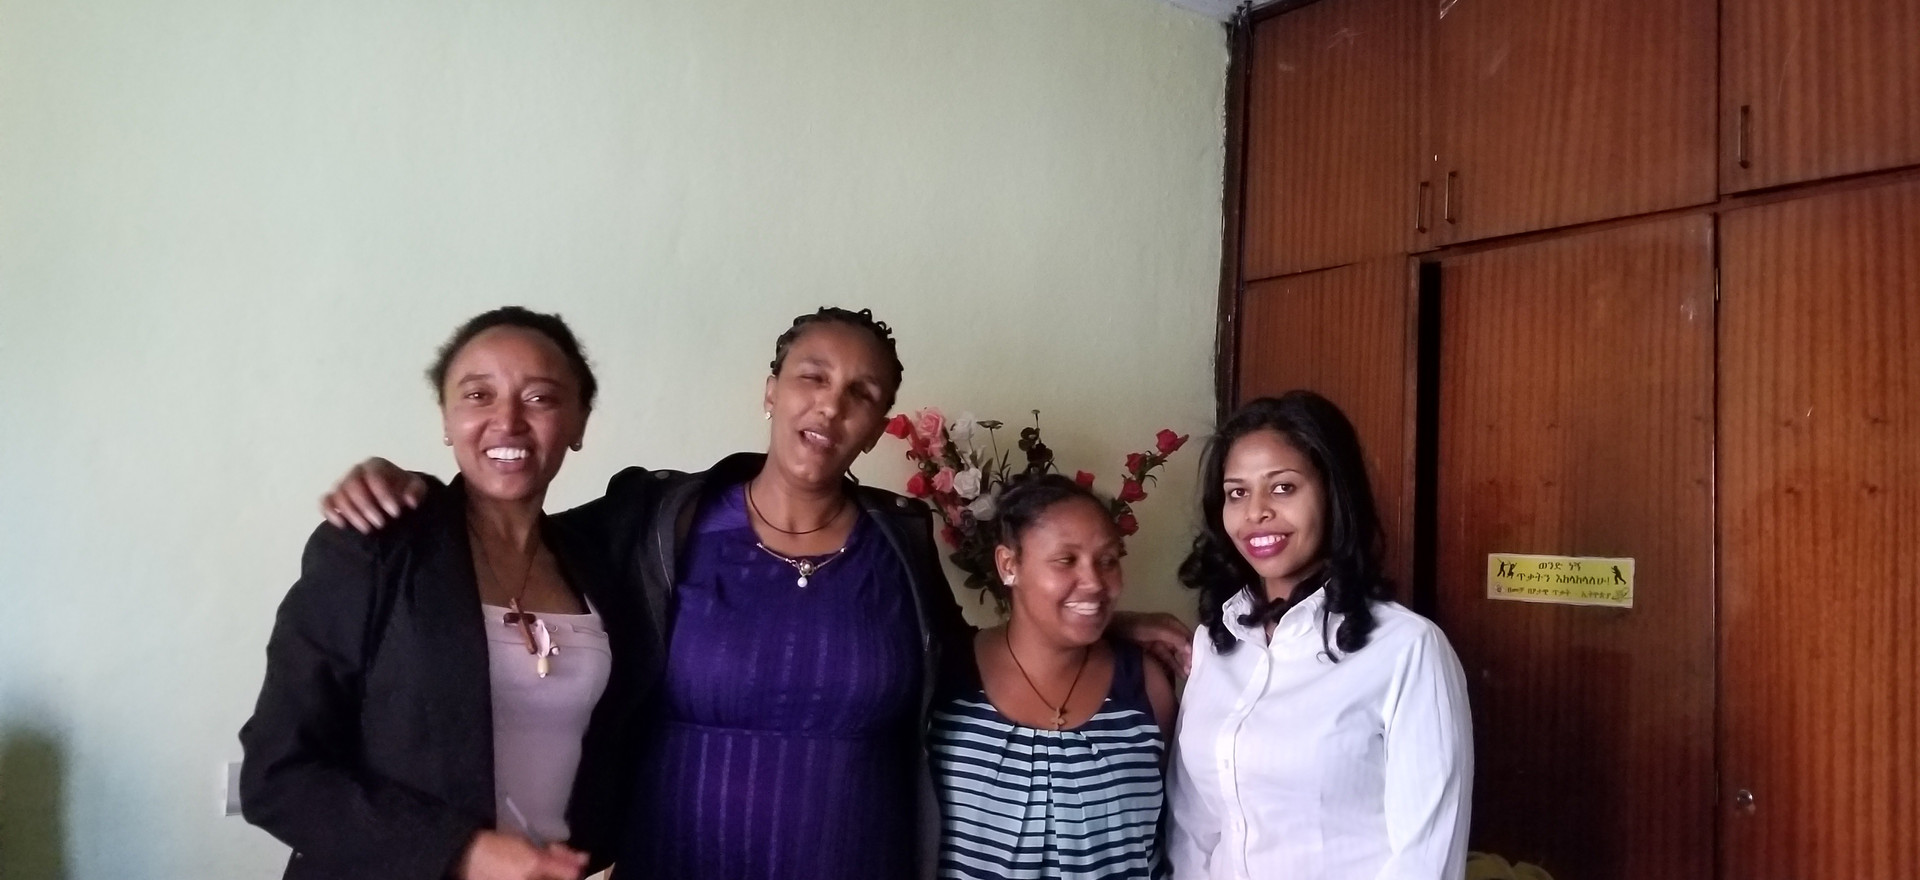 The women of EWDNA